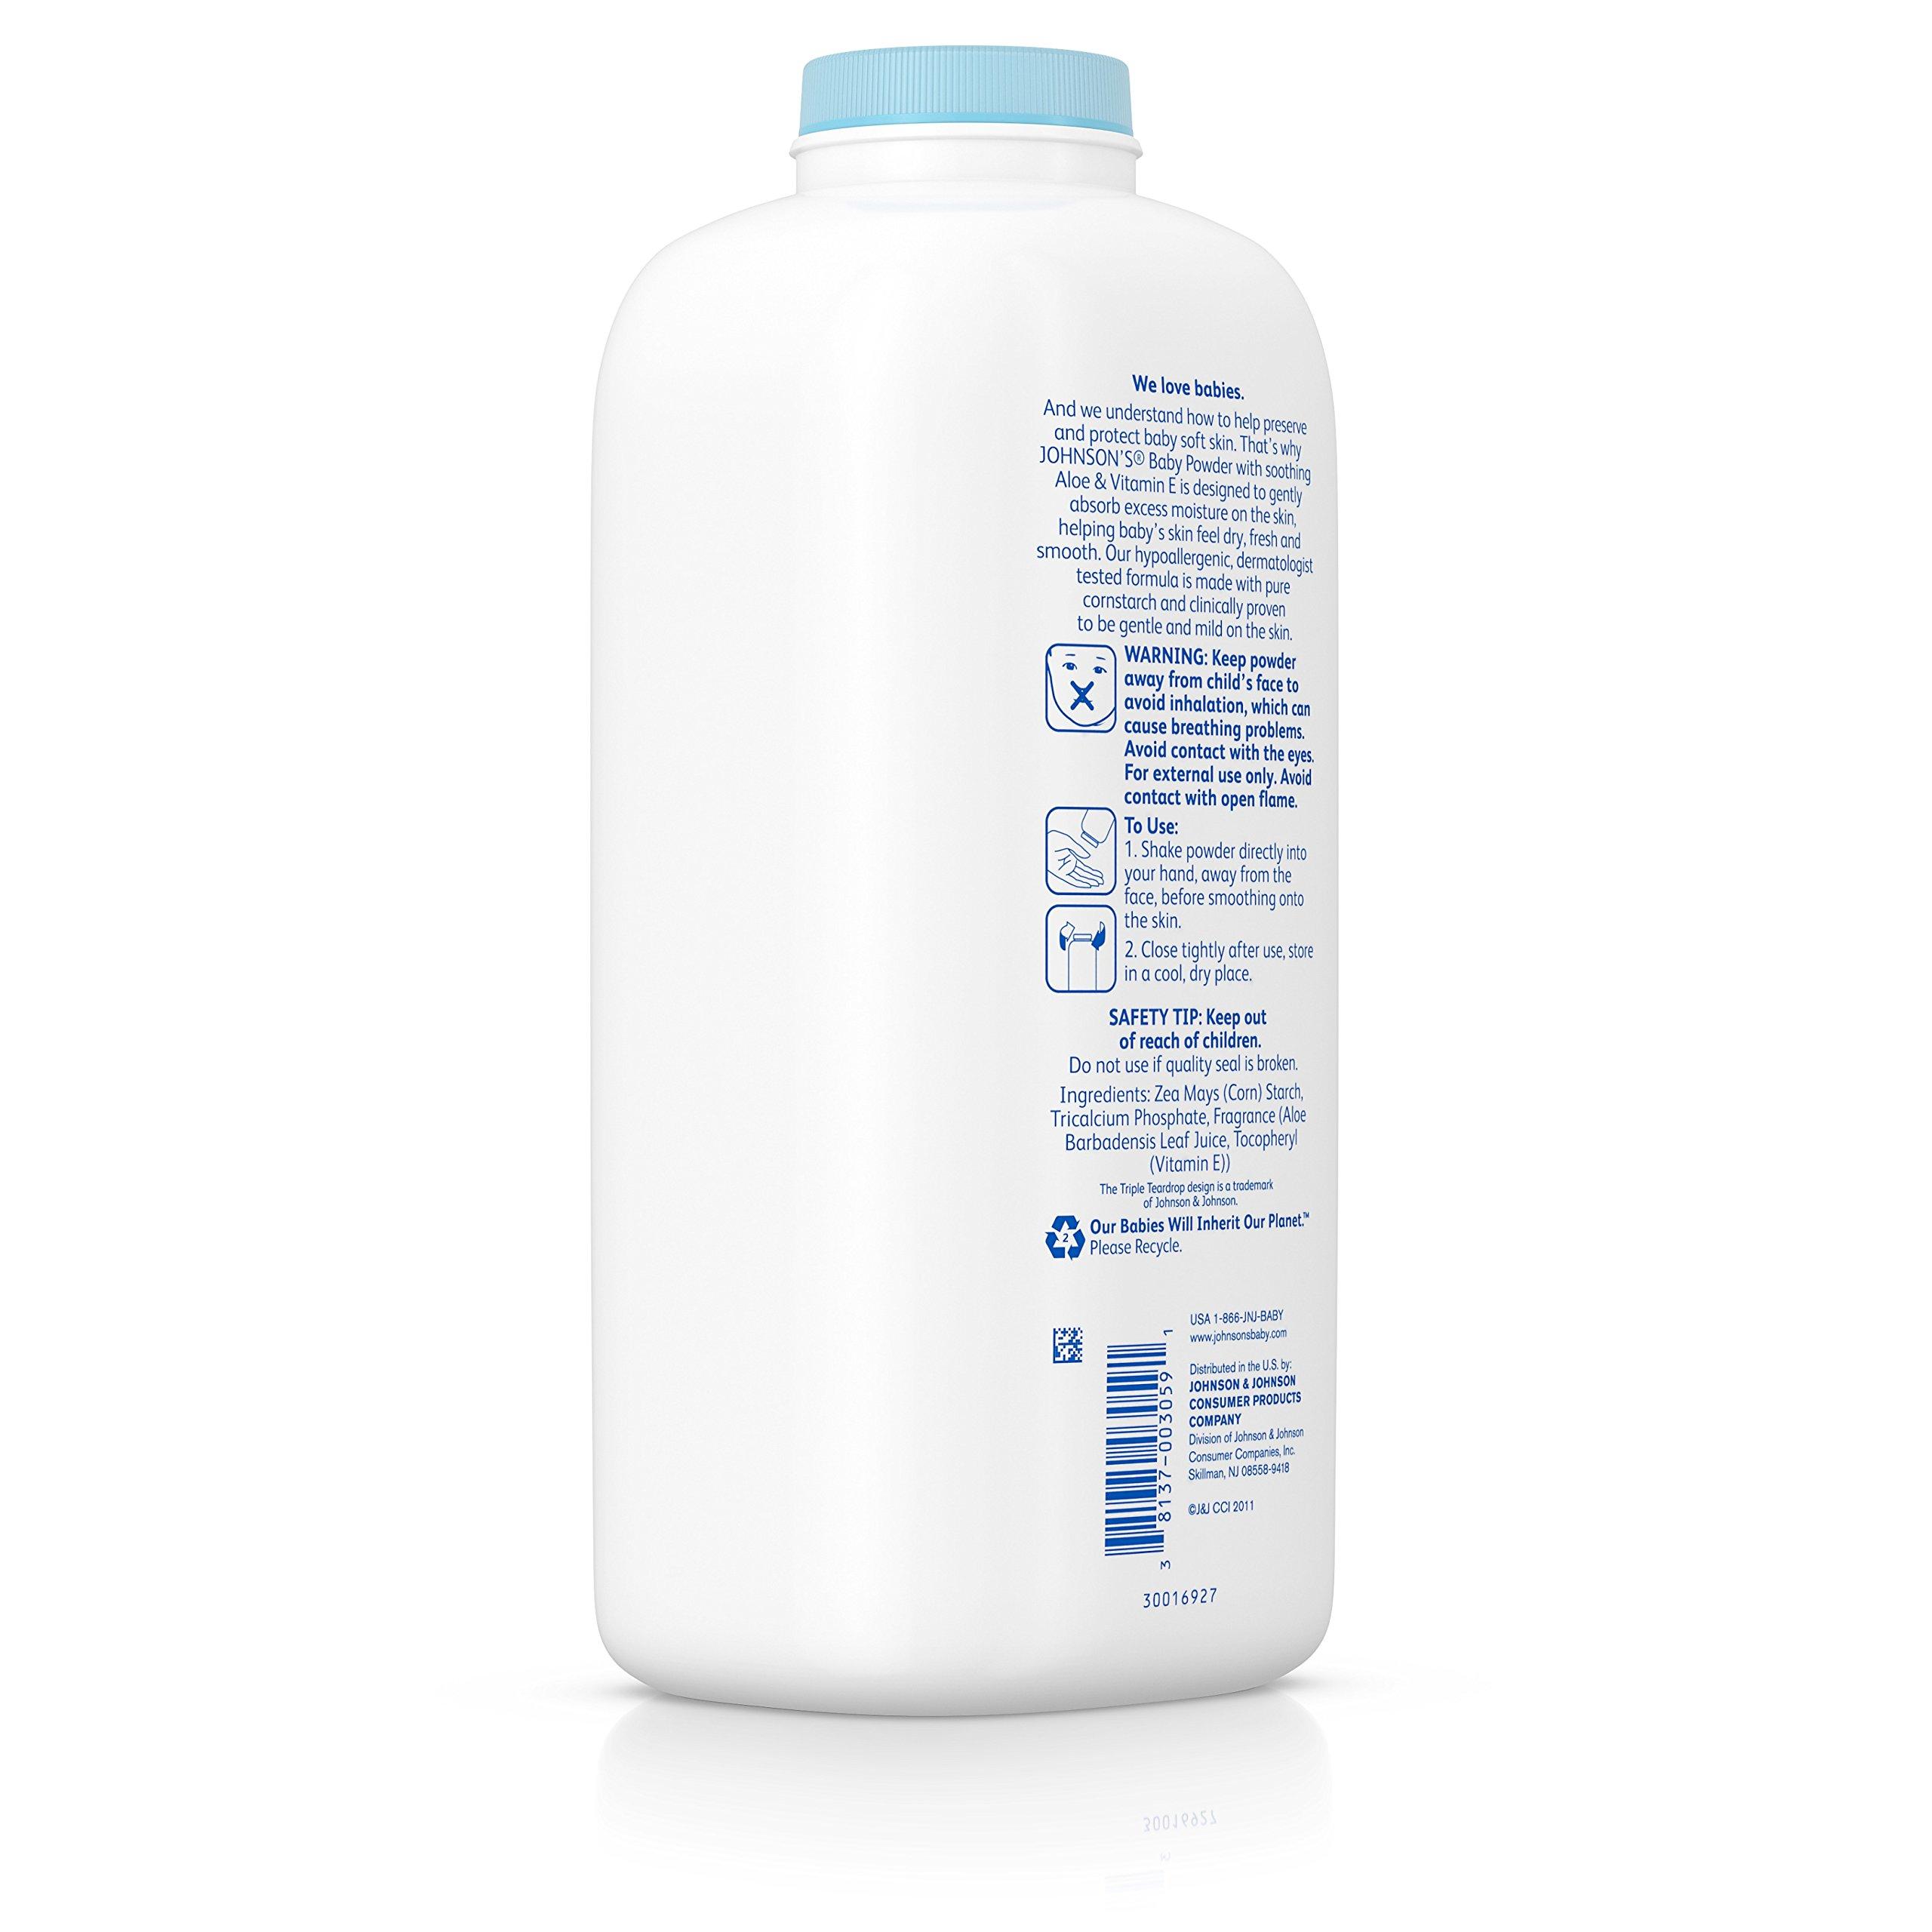 Johnson's Baby Powder With Aloe Vera & Vitamin E, Diaper Rash Protection, 22 Oz. (Pack of 6) by Johnson's Baby (Image #7)